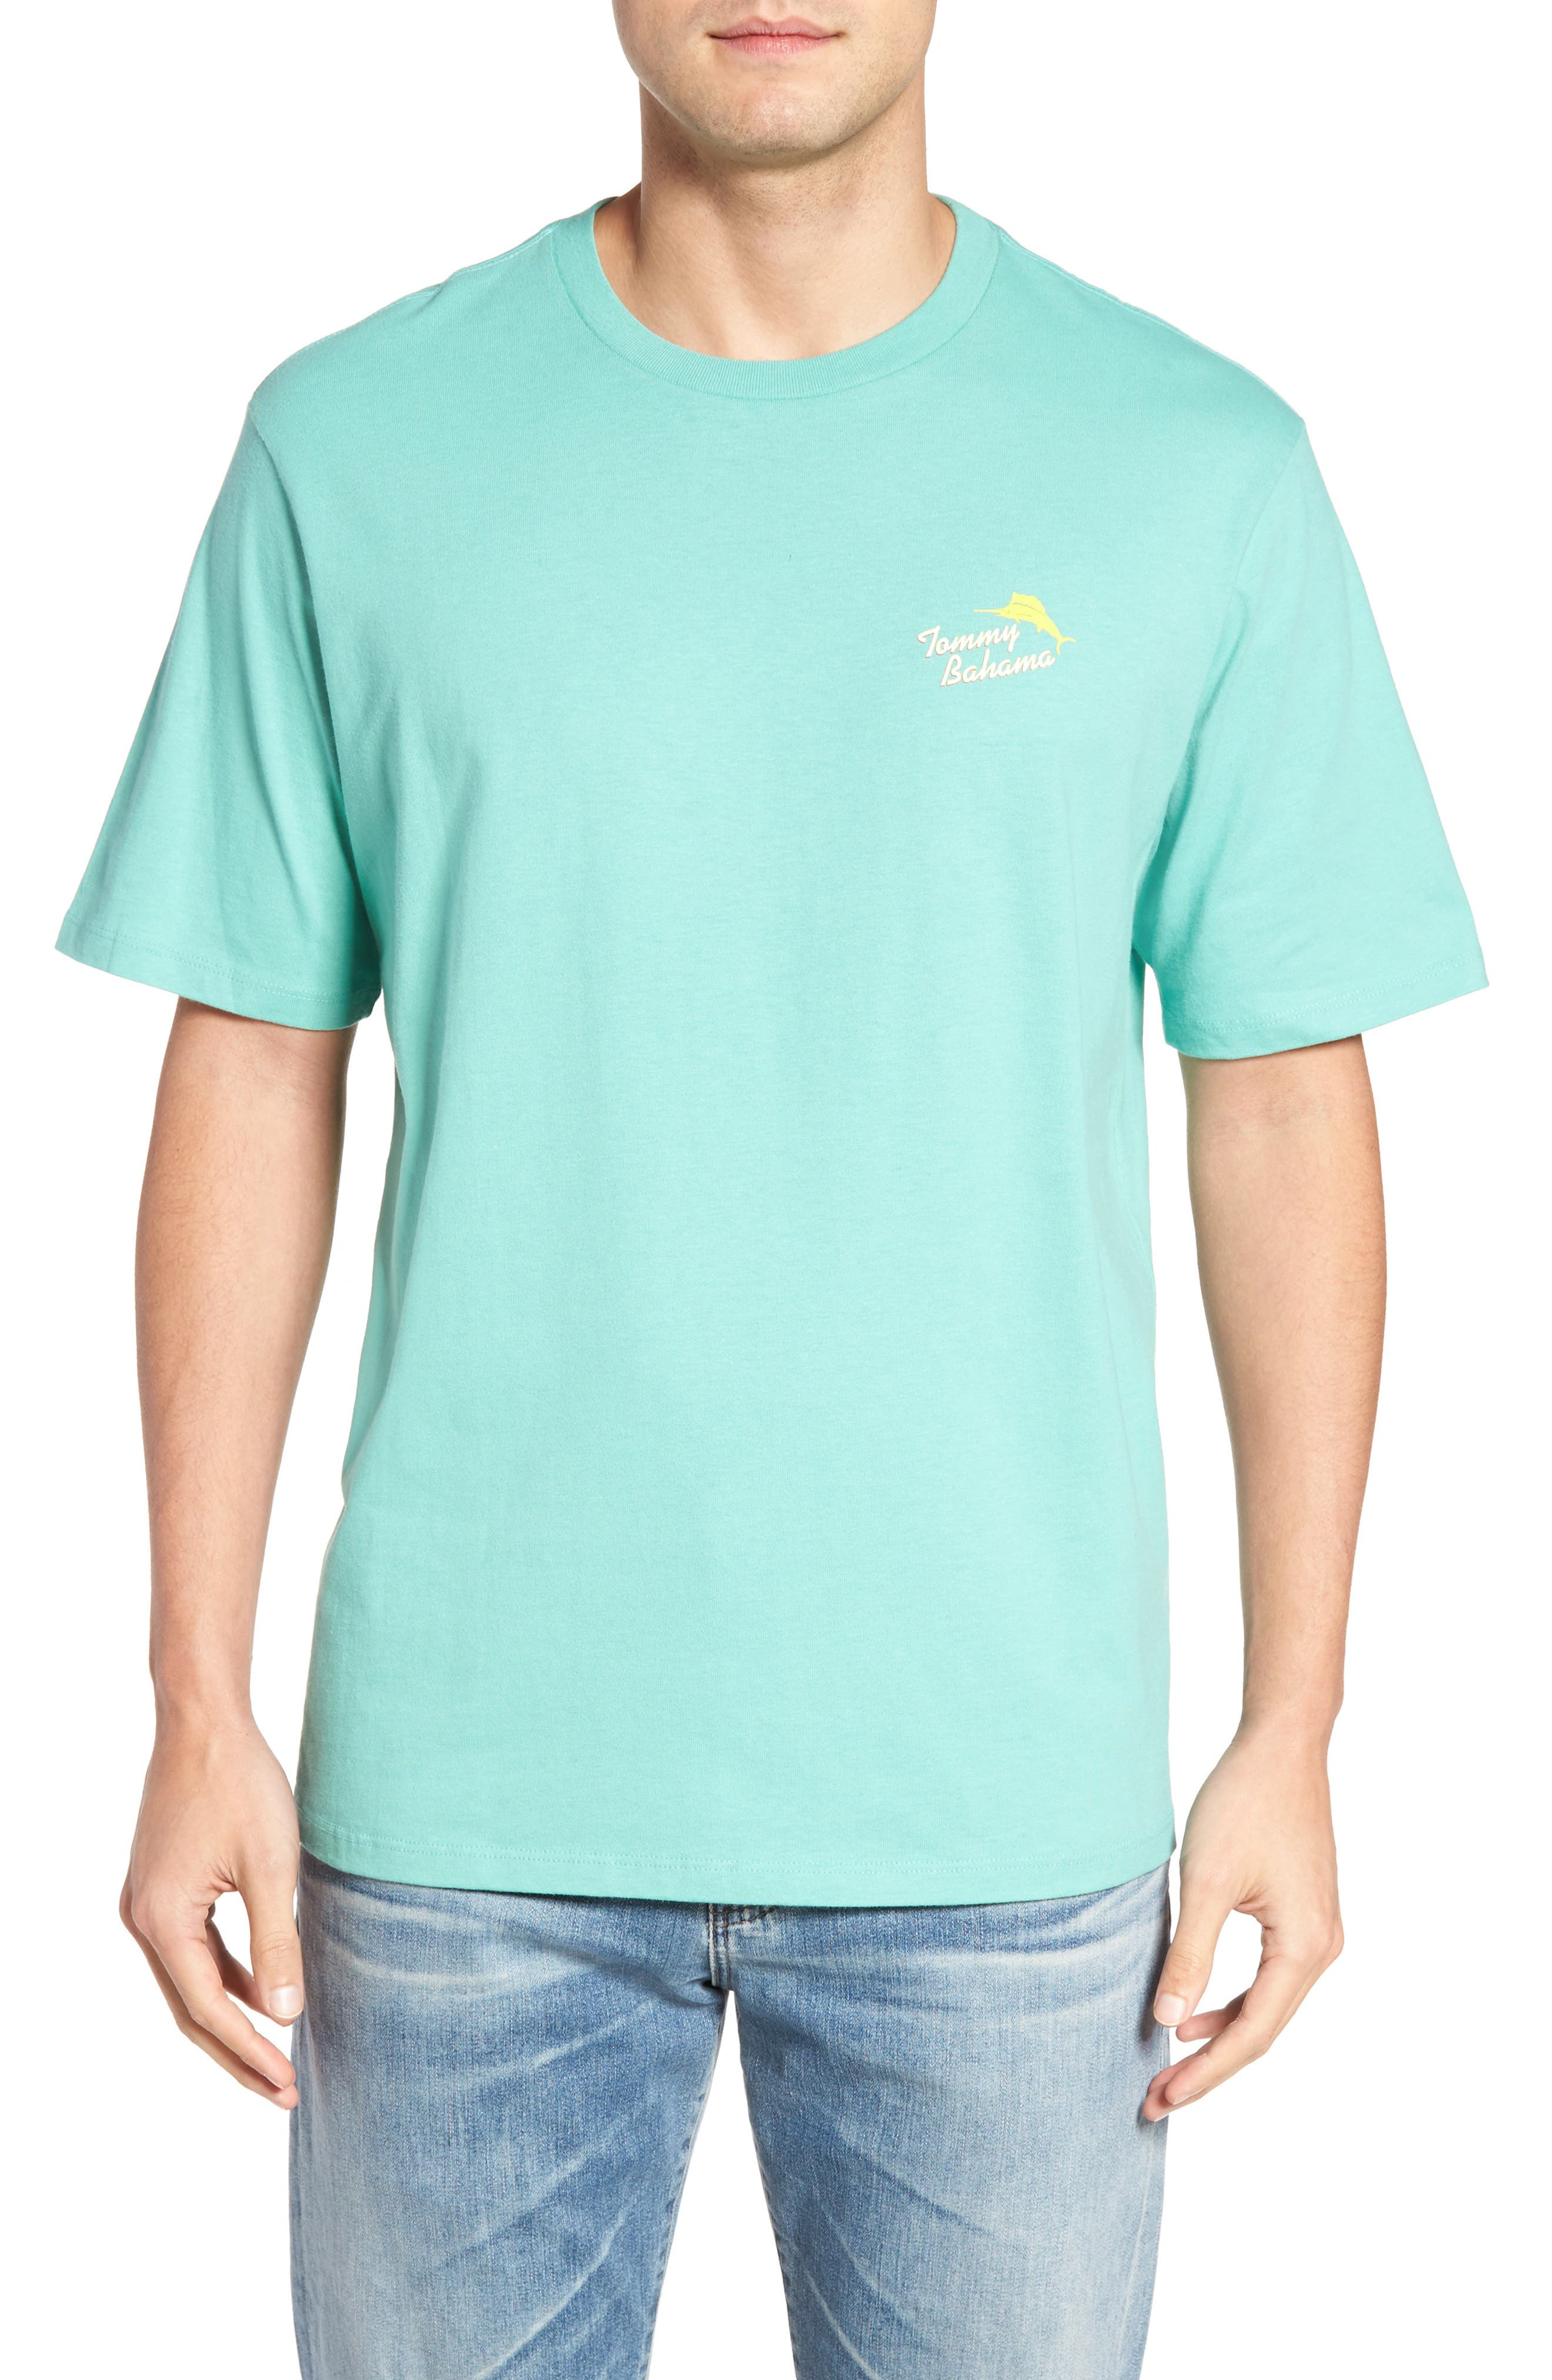 Spring Fling T-Shirt,                         Main,                         color, 030